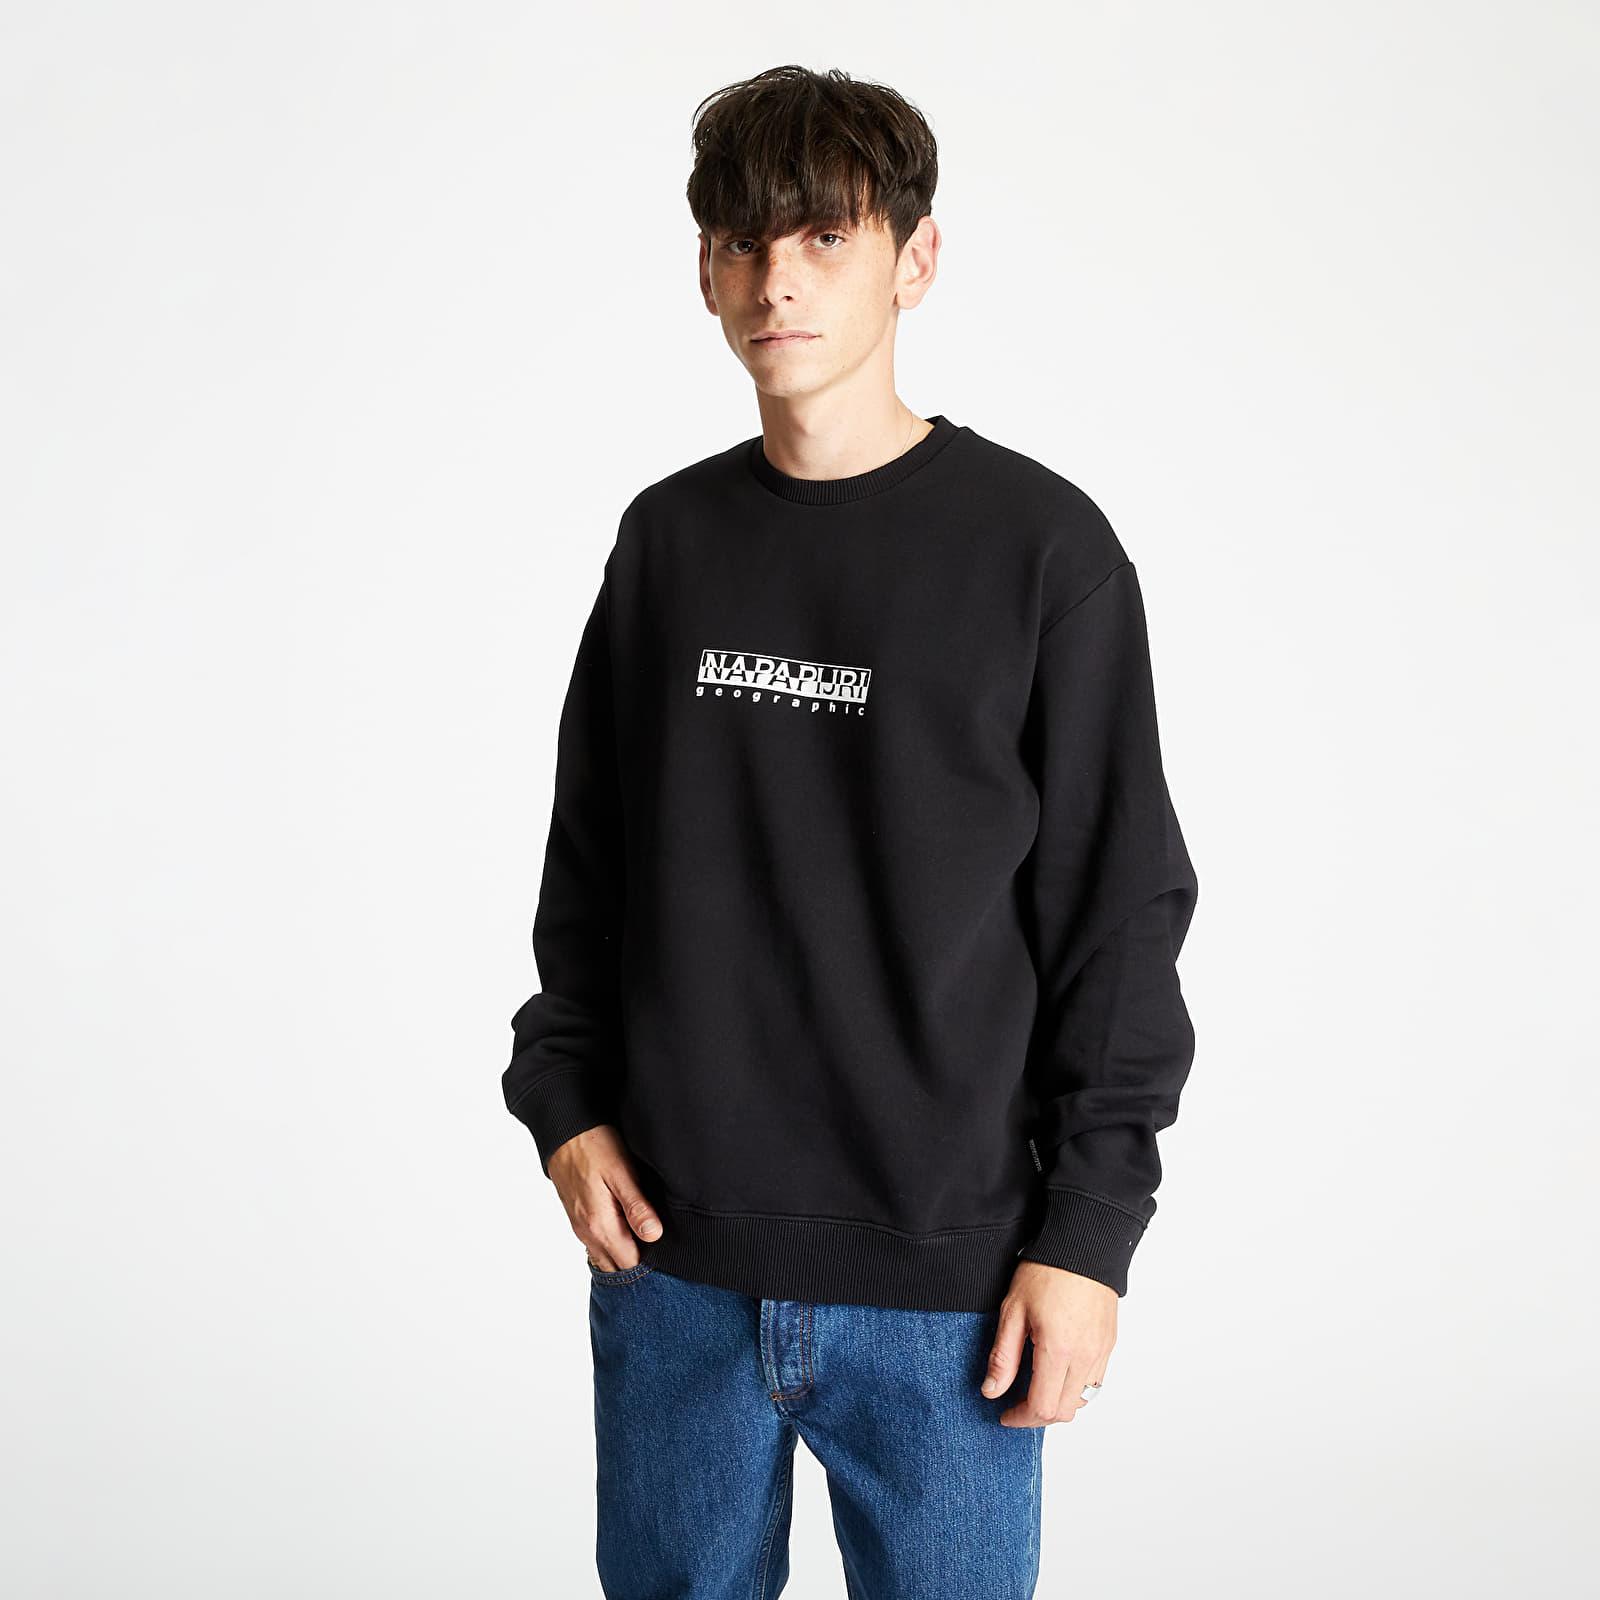 Mikiny a svetry NAPAPIJRI Box Sweatshirt Black